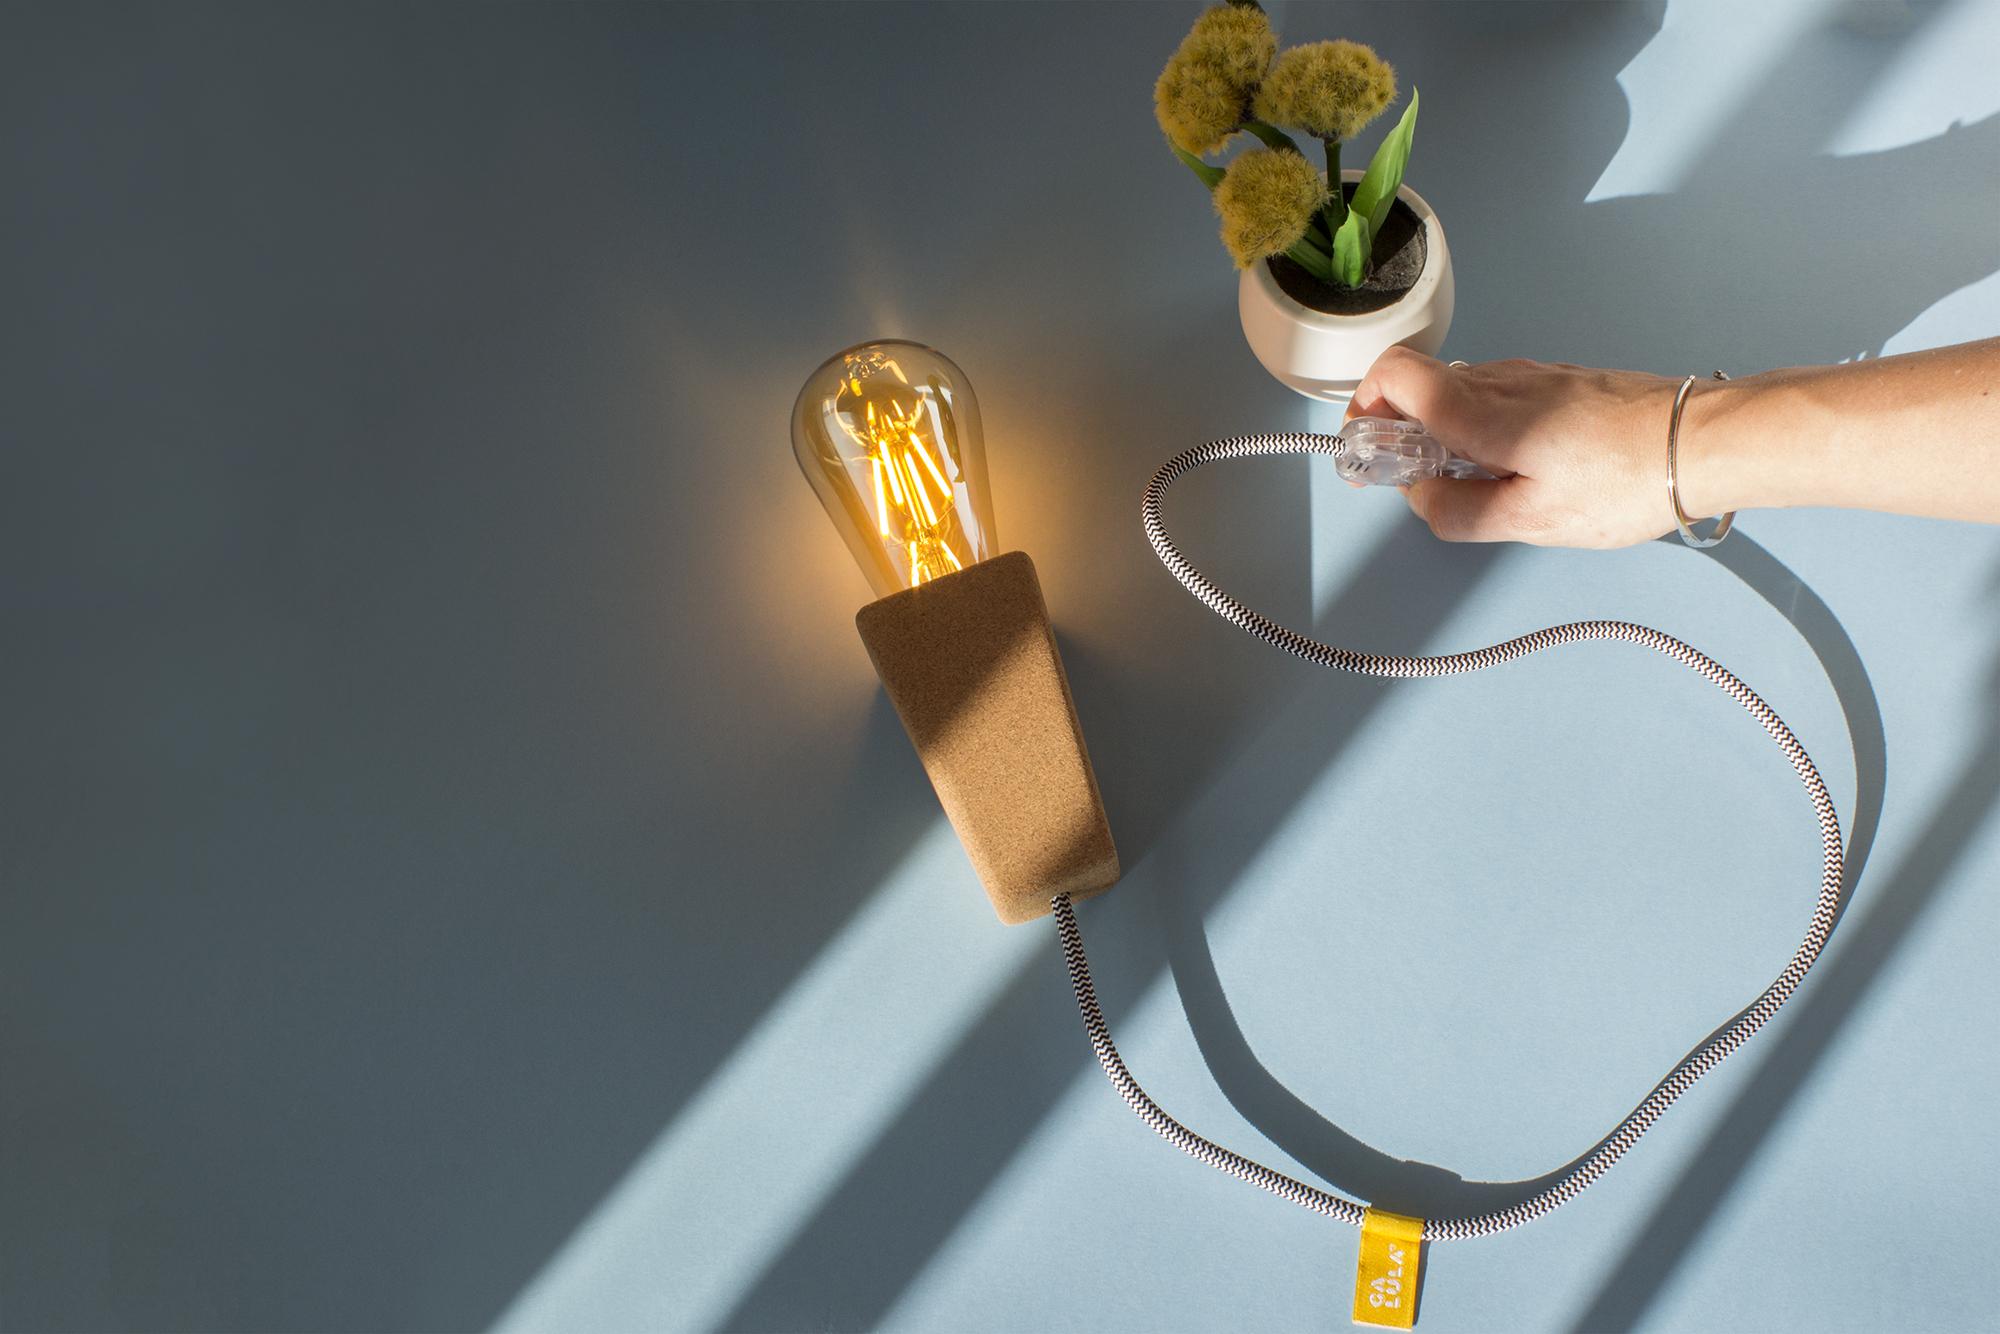 low-Galula-magneto-lamp-amb-04.jpg